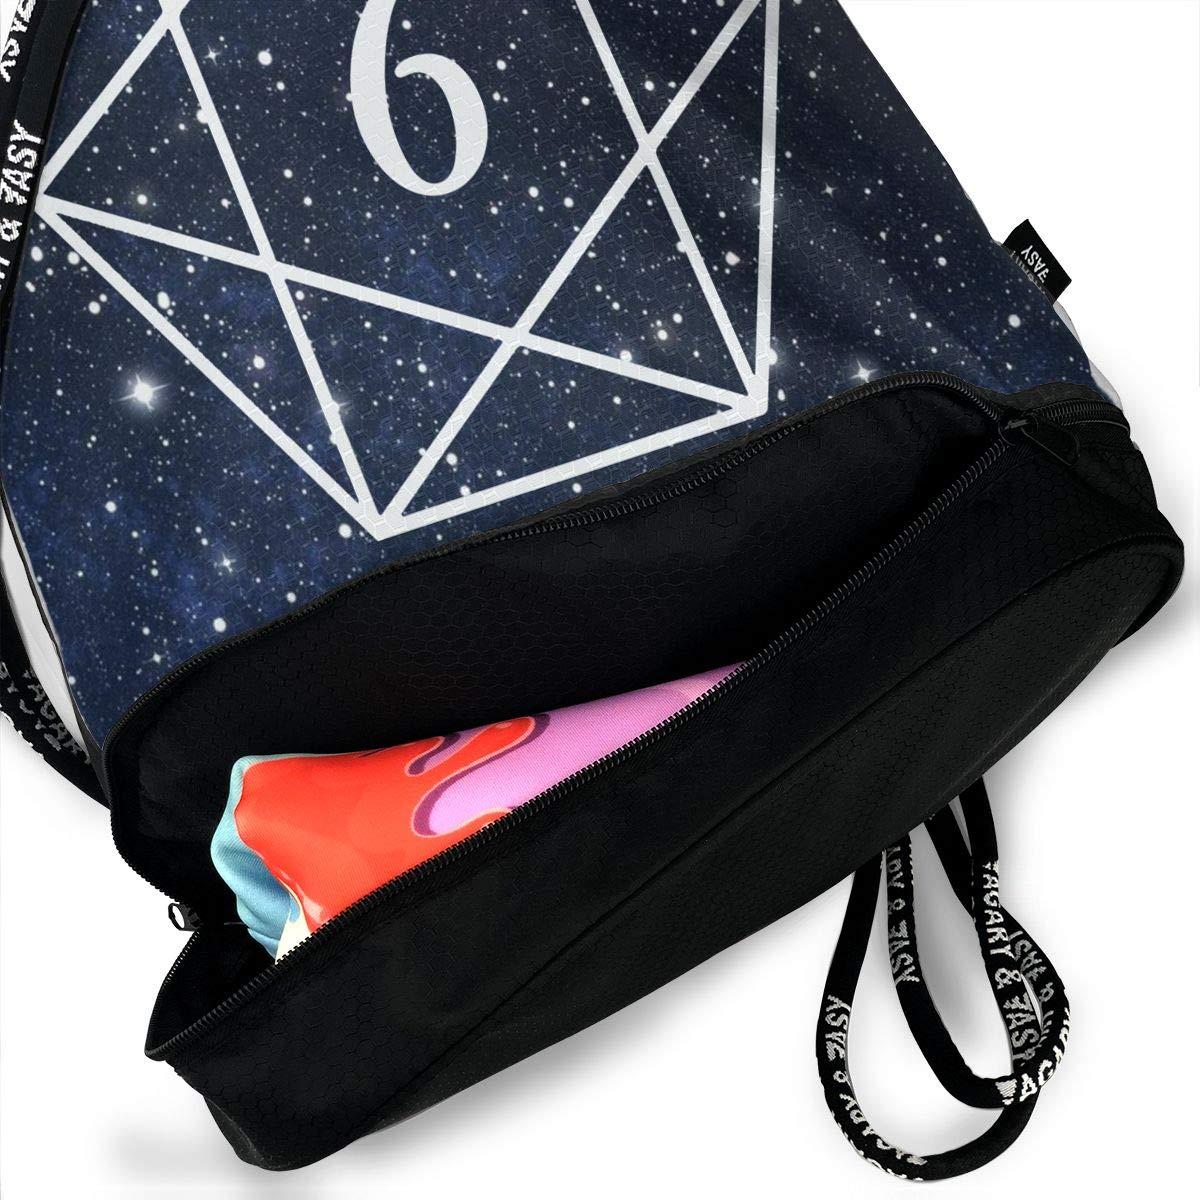 Sacred Geometry Men /& Women Drawstring Backpack Bag Beam Mouth School Travel Backpack Rucksack Shoulder Bags